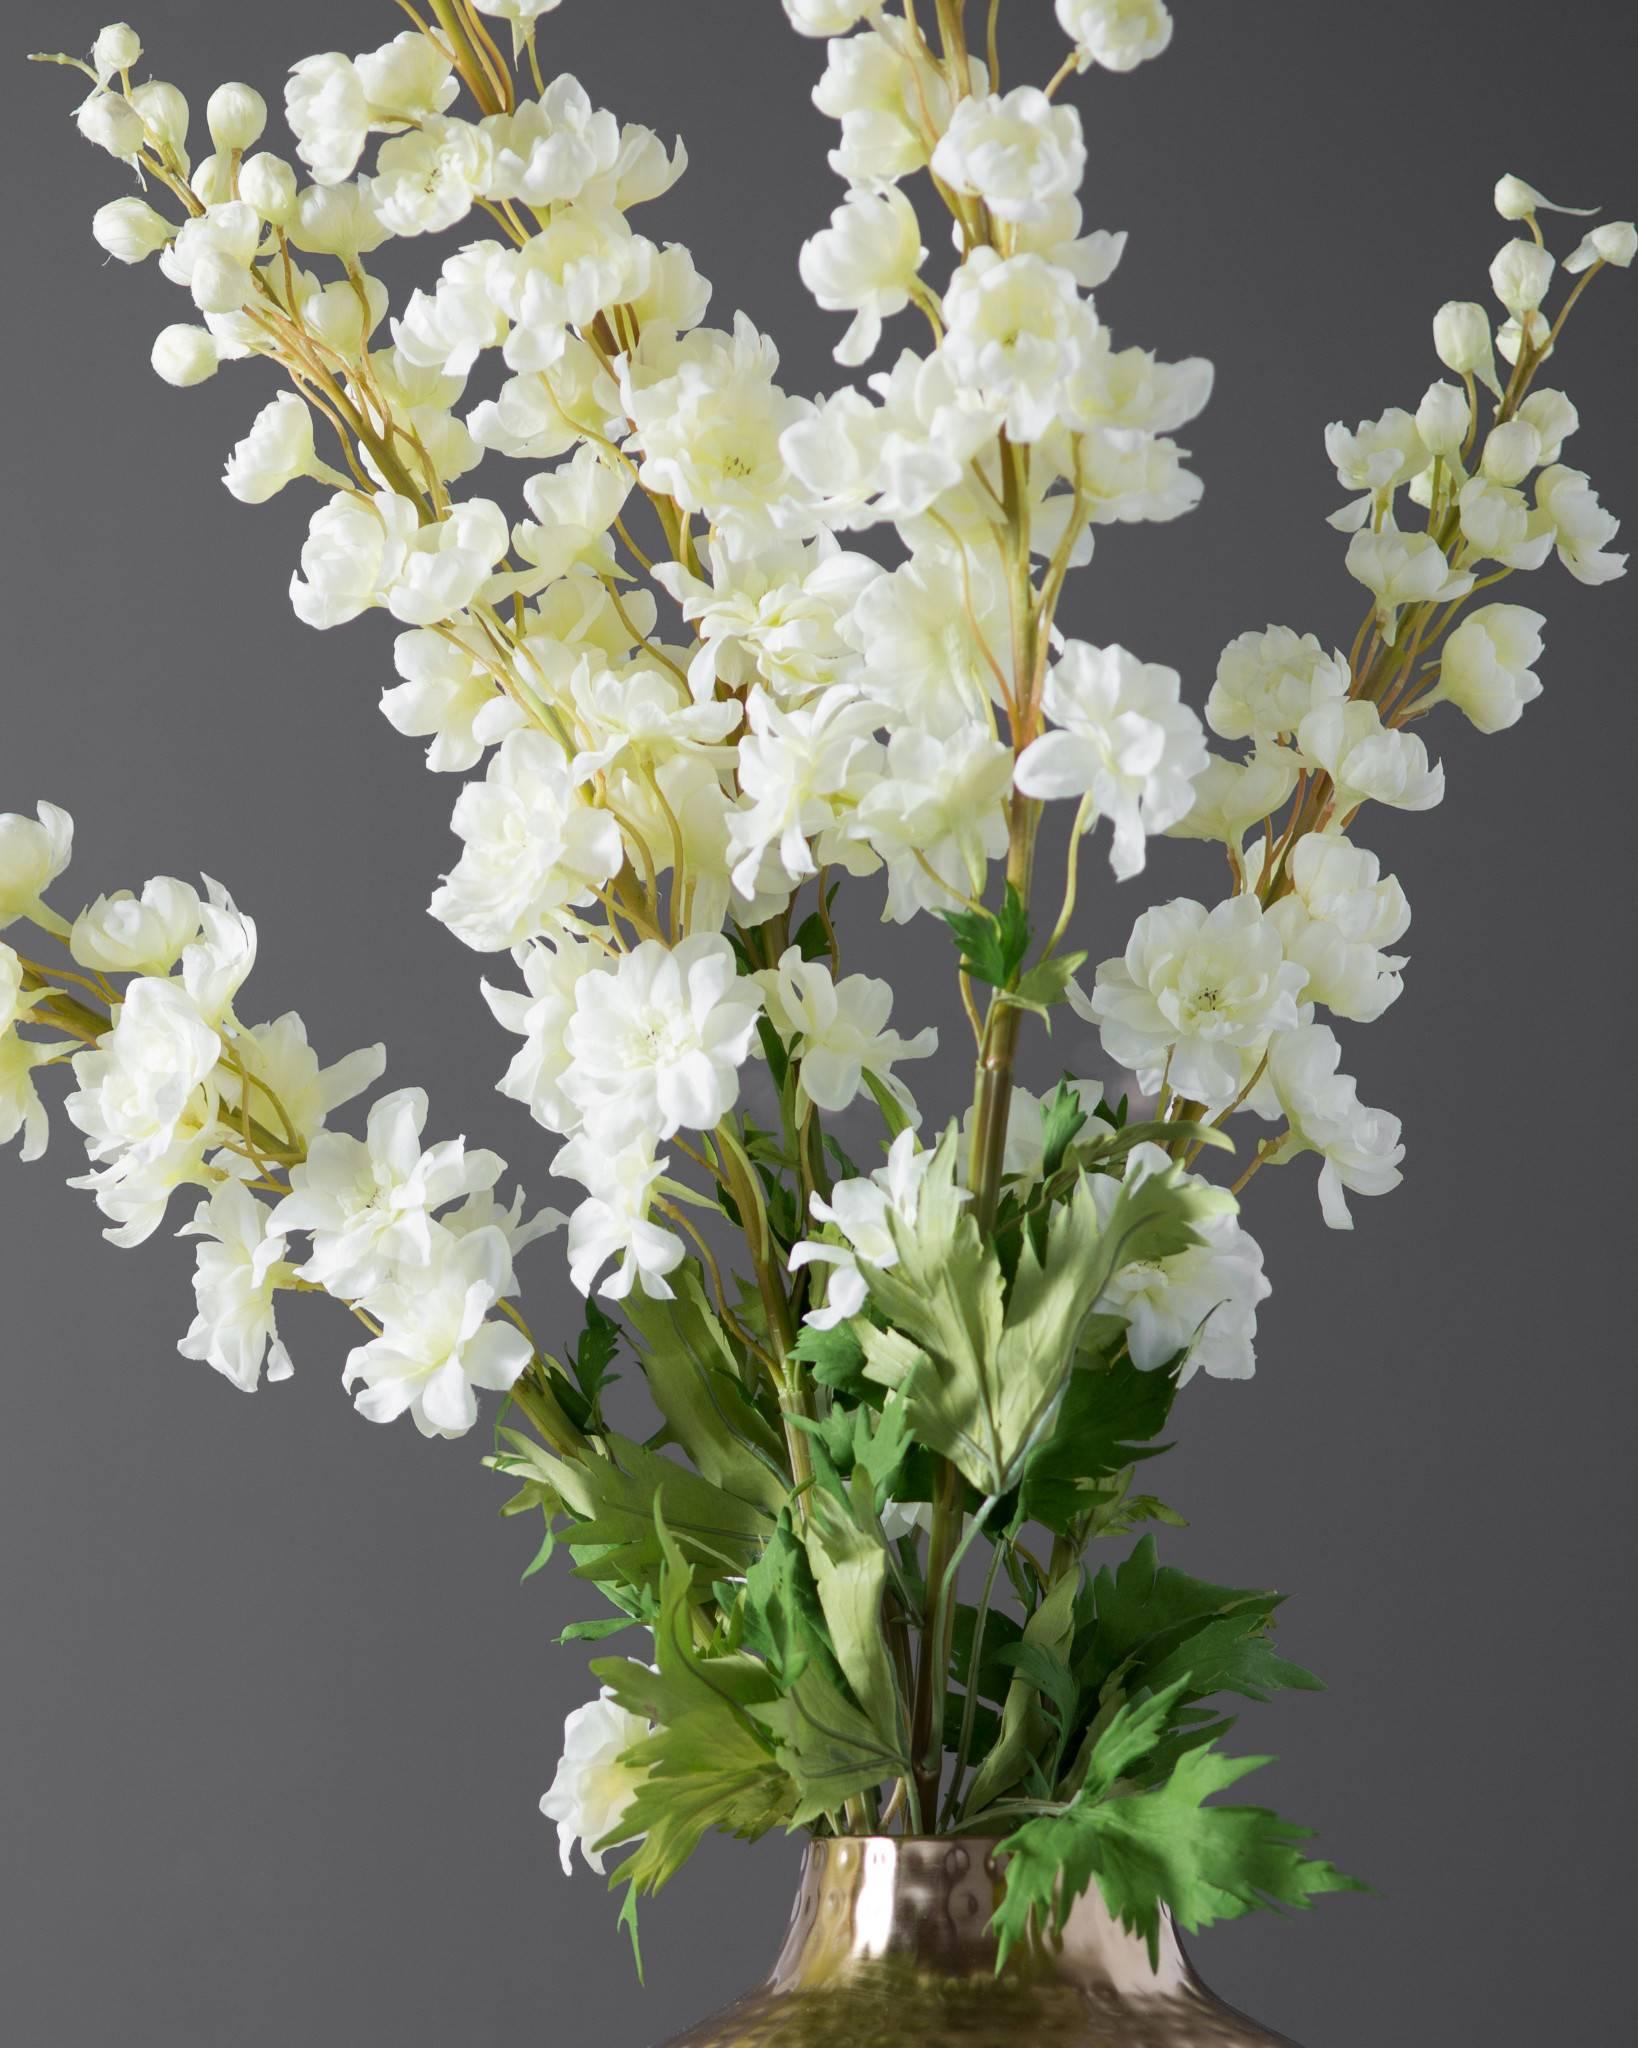 Delphinium flower stems balsam hill delphinium flower stems mightylinksfo